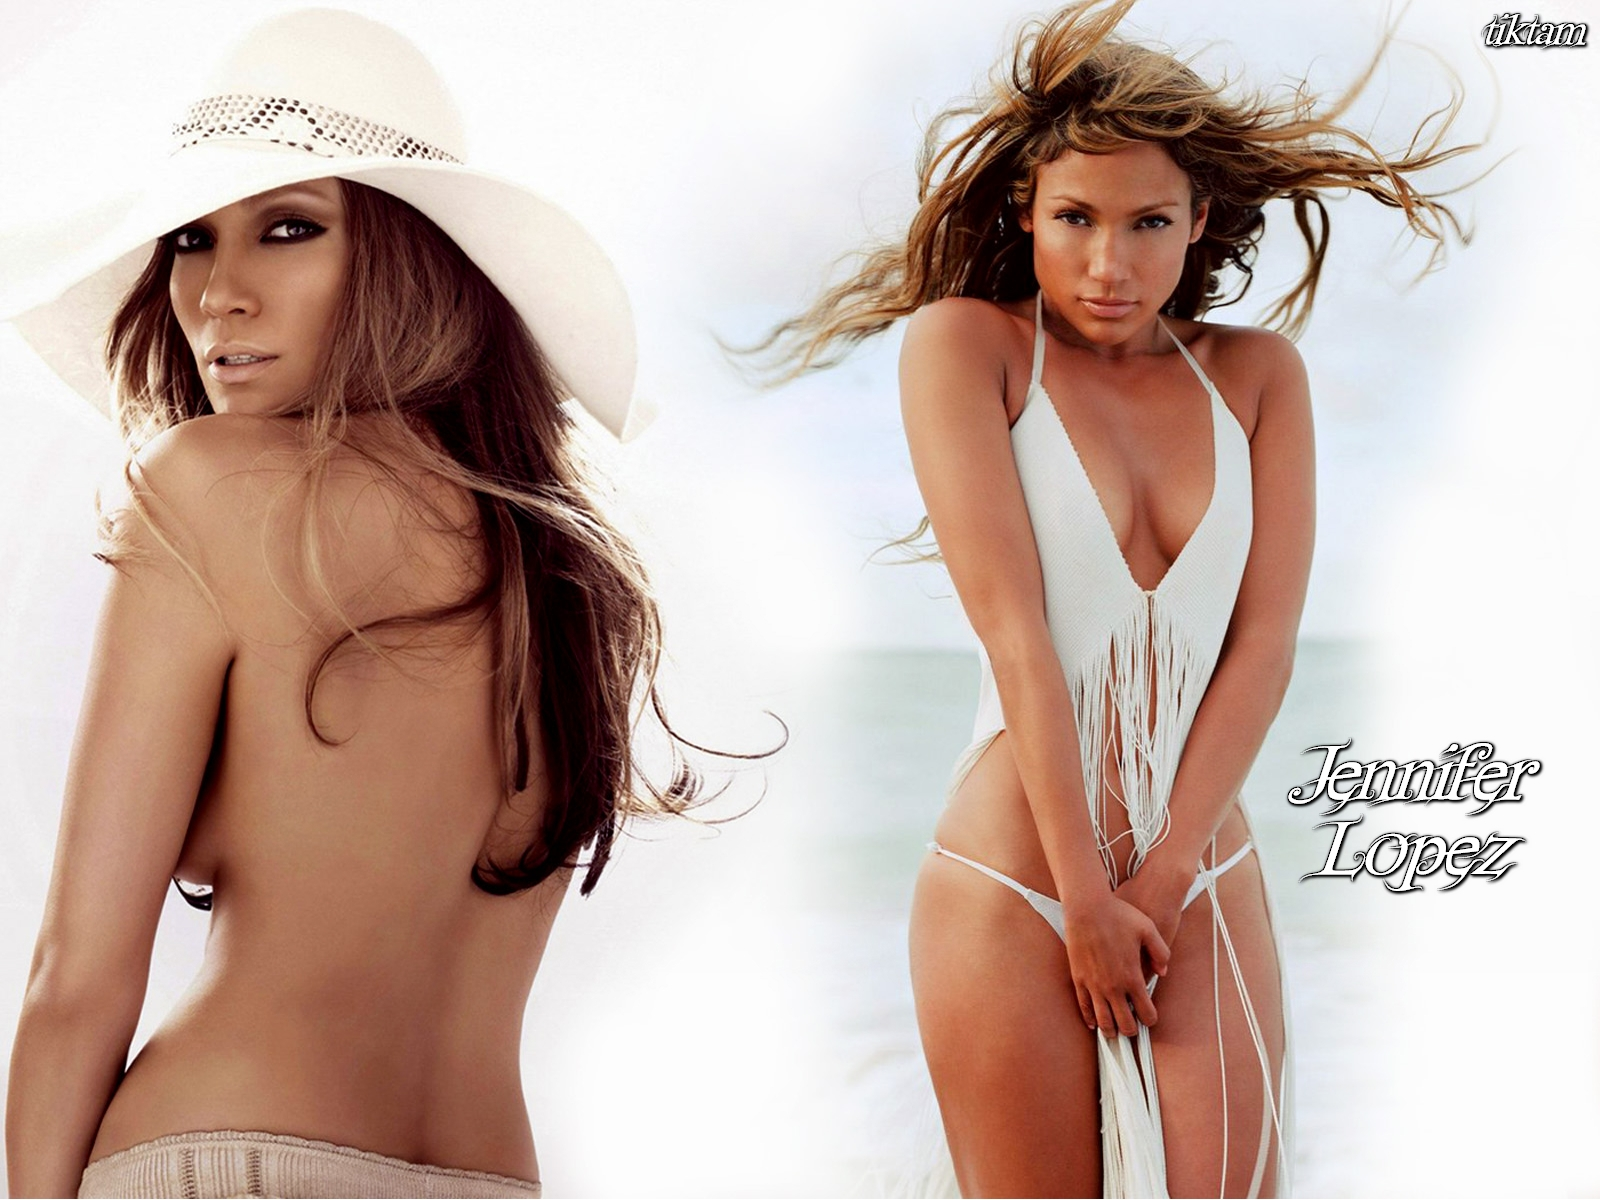 http://3.bp.blogspot.com/-z40koJWEzmg/TiBekn-nVaI/AAAAAAAABjU/huShWqmmxMU/s1600/Jennifer-Lopez-jennifer-lopez-43913_1600_1200.jpg